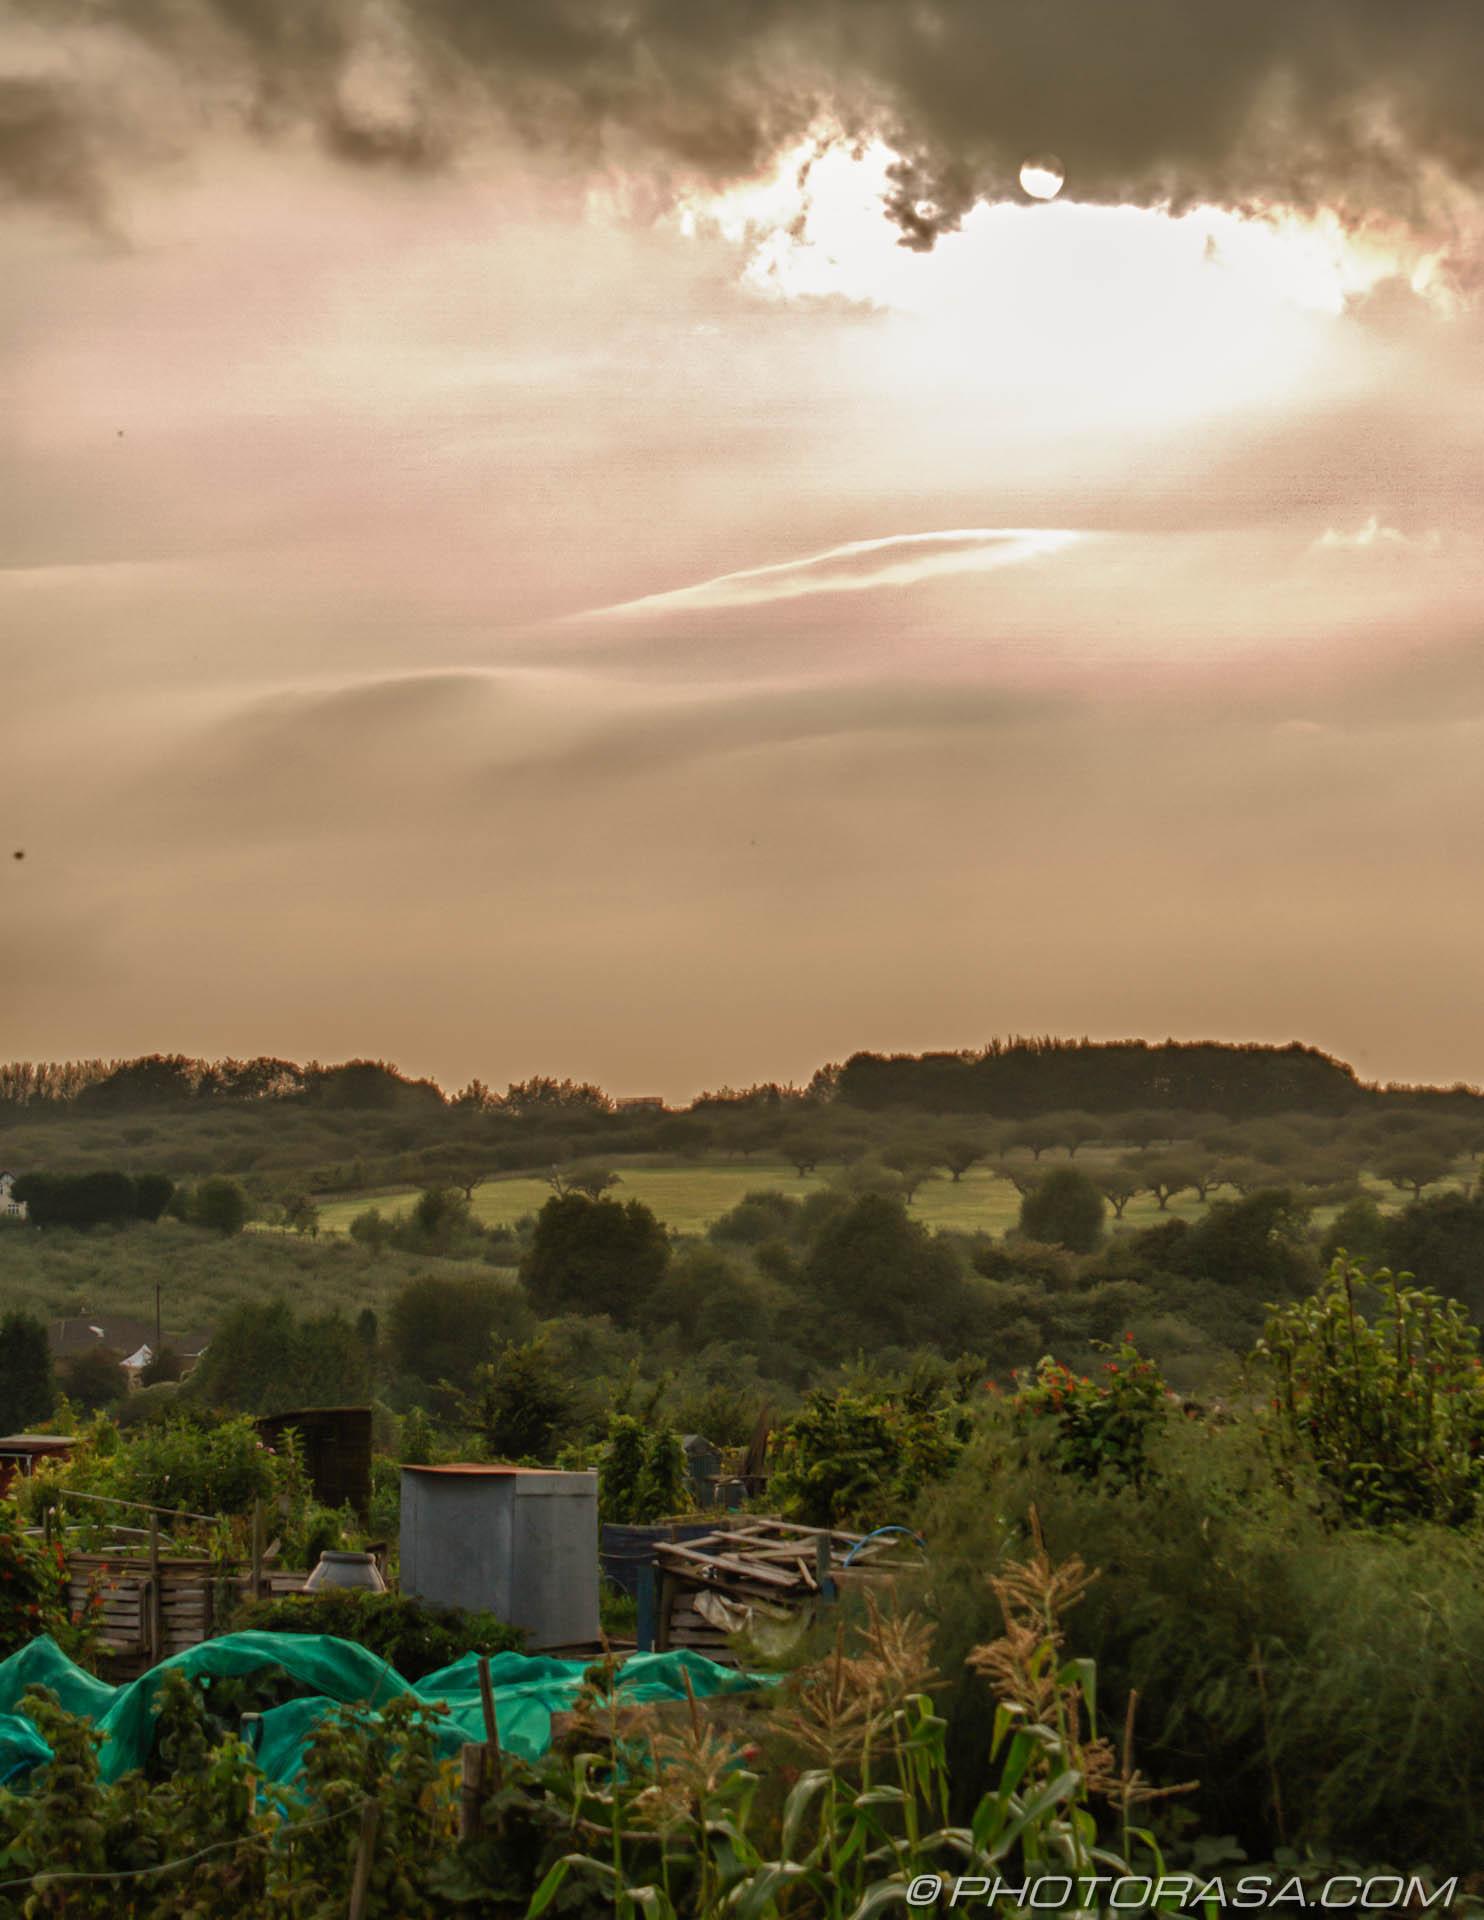 https://photorasa.com/loose-village/sun-over-cloudy-haze-kentish-fields/